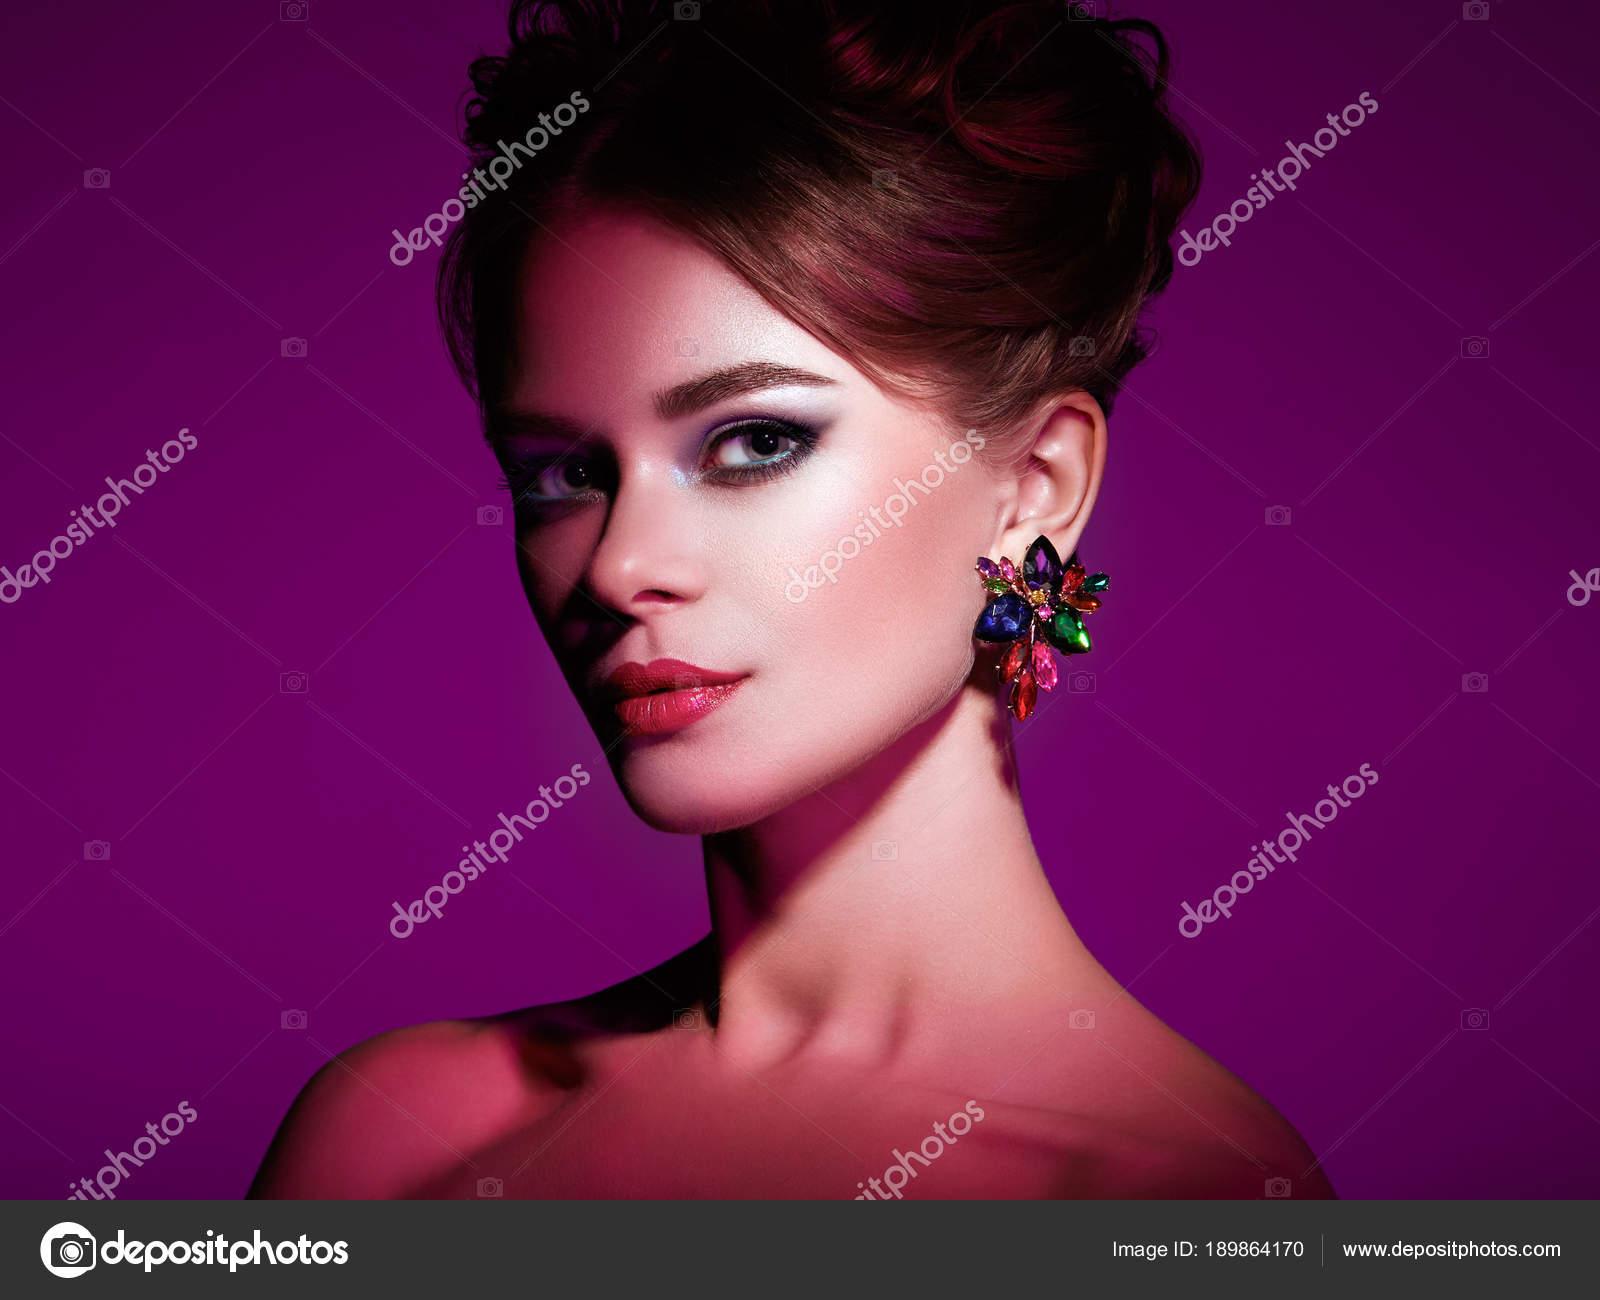 Femme Brunette Avec Une Coiffure Elegante Photographie